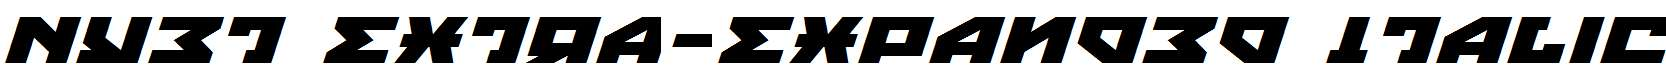 Nyet-Extra-Expanded-Italic